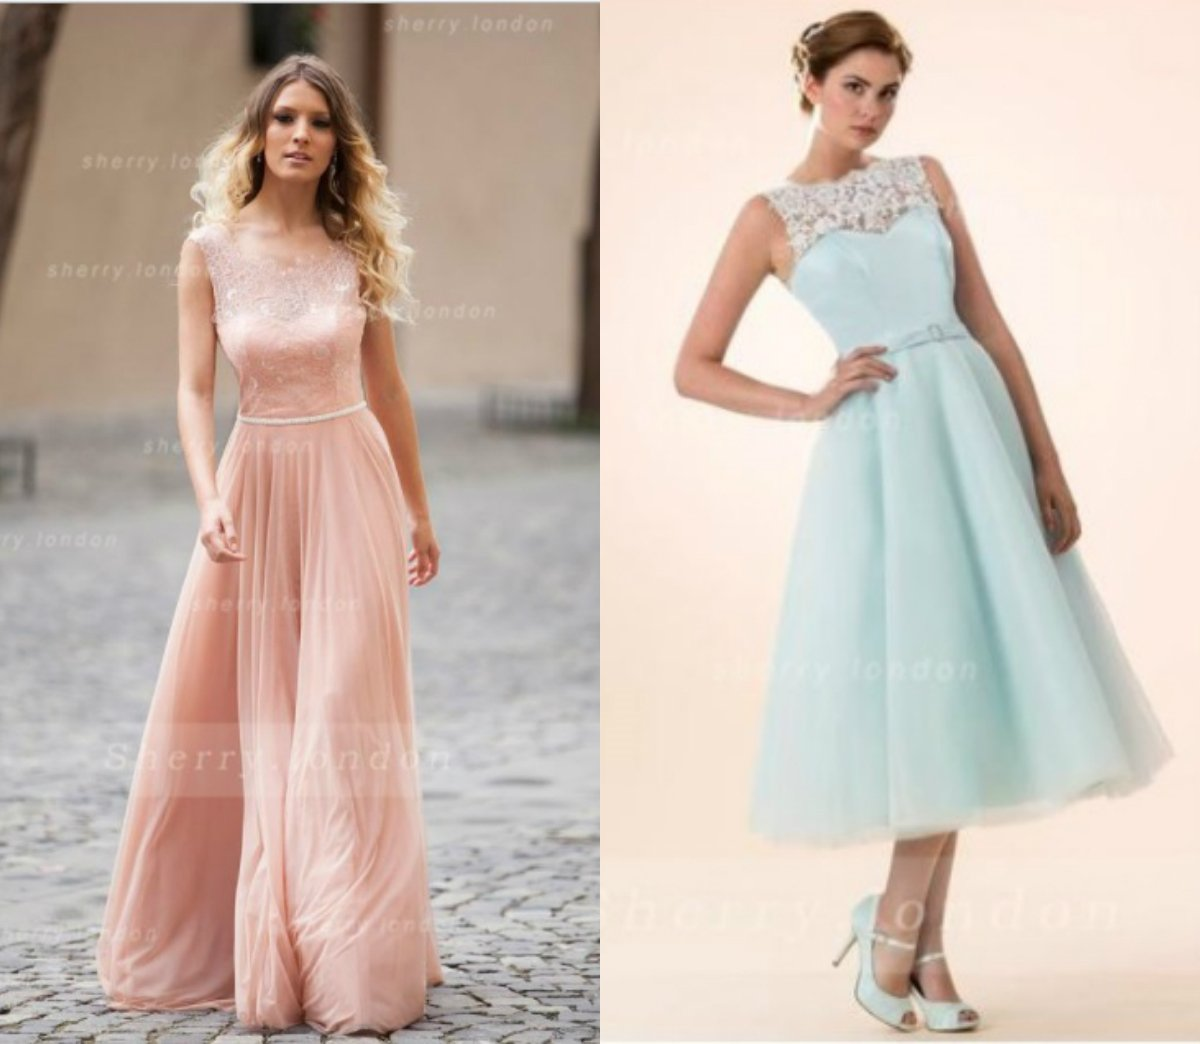 sukienki-na-wesele_sukienki-na-studni%25